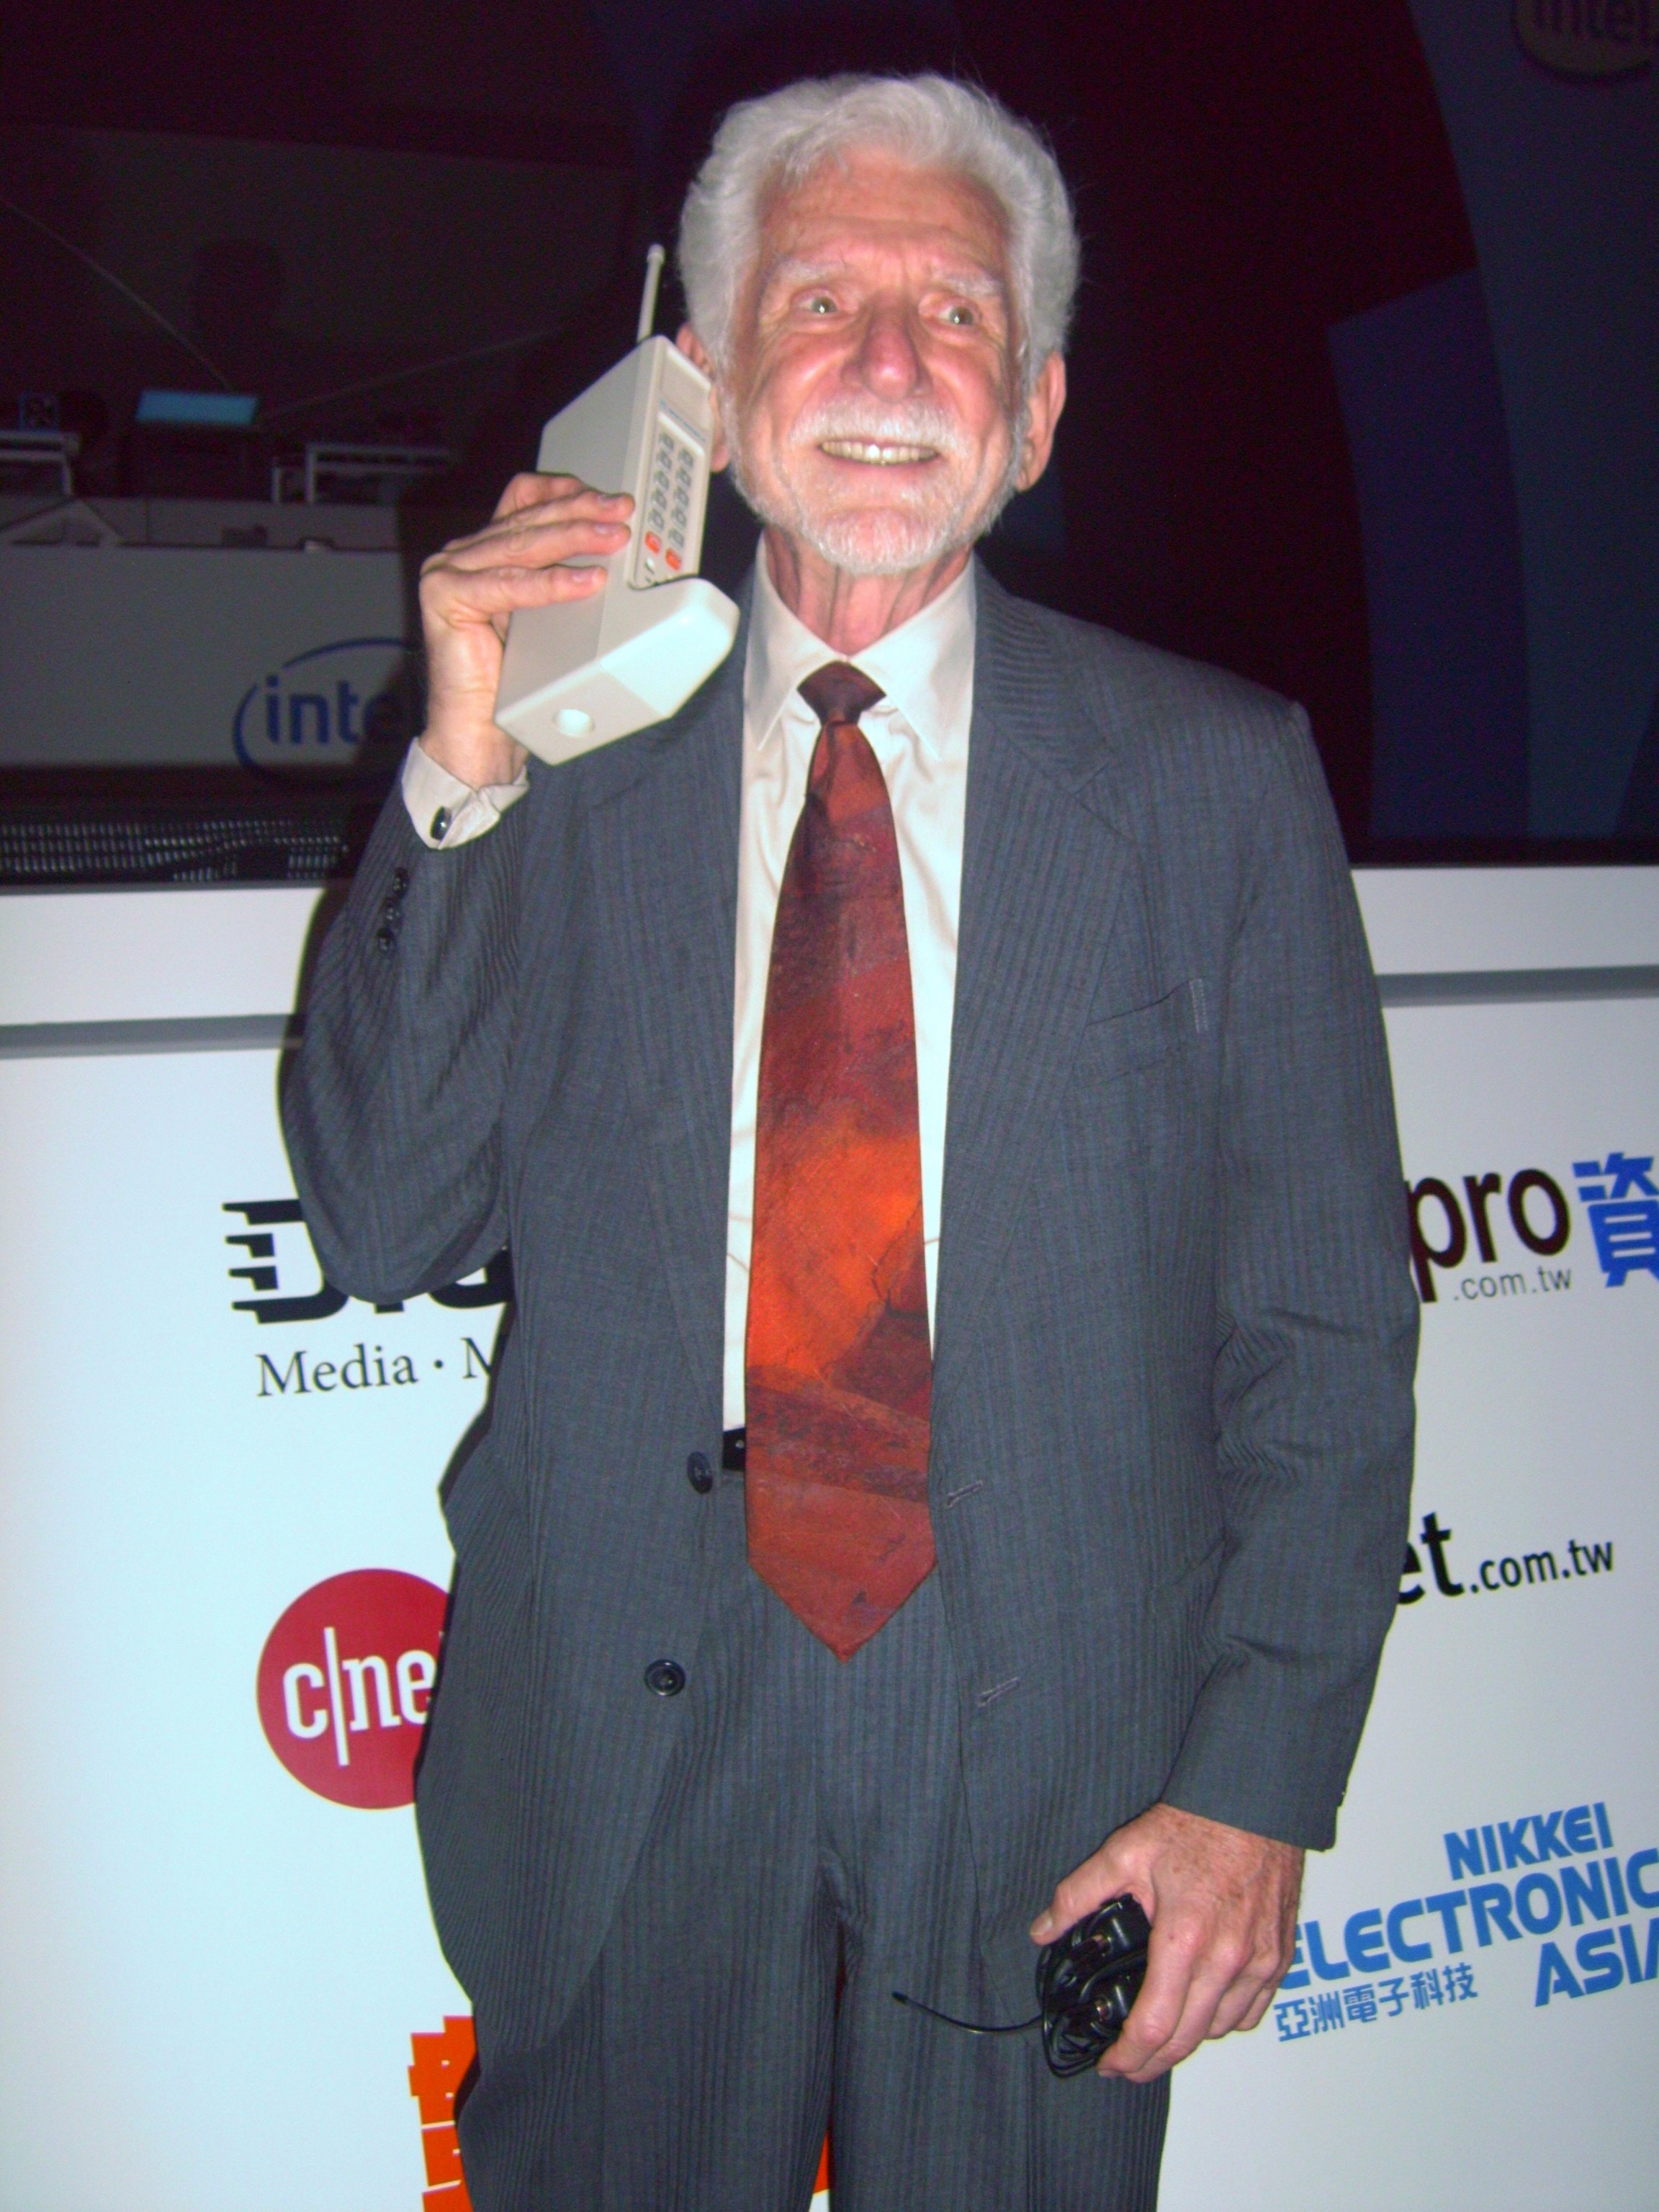 Motorola's Martin Cooper reenacting the world's first hand-held mobile phone call with the Motorola DynaTAC